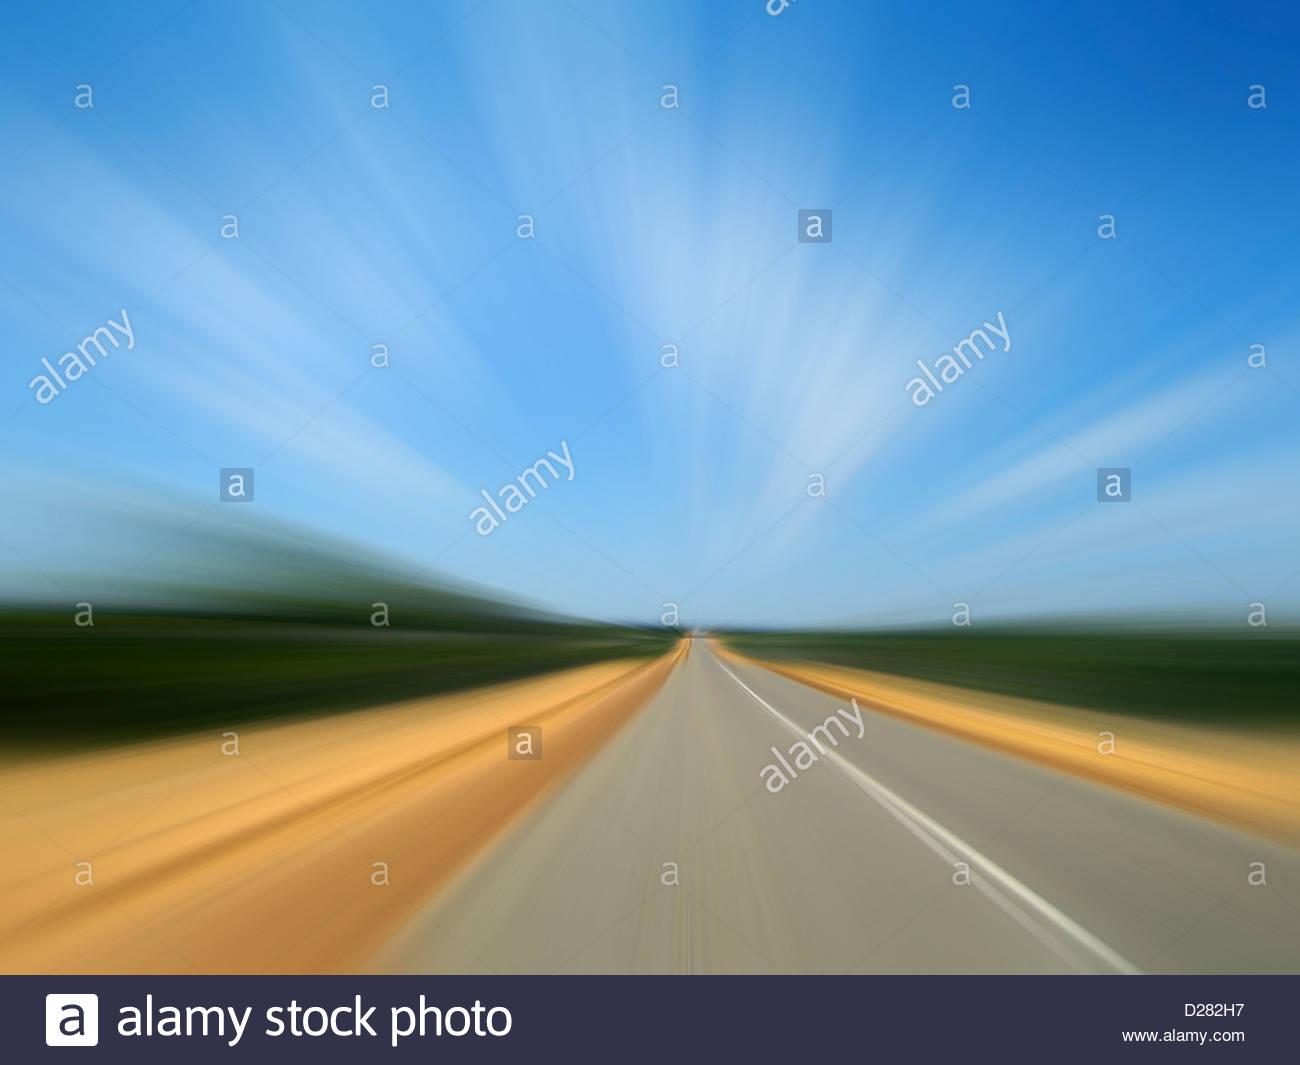 Defocused road - Stock Image